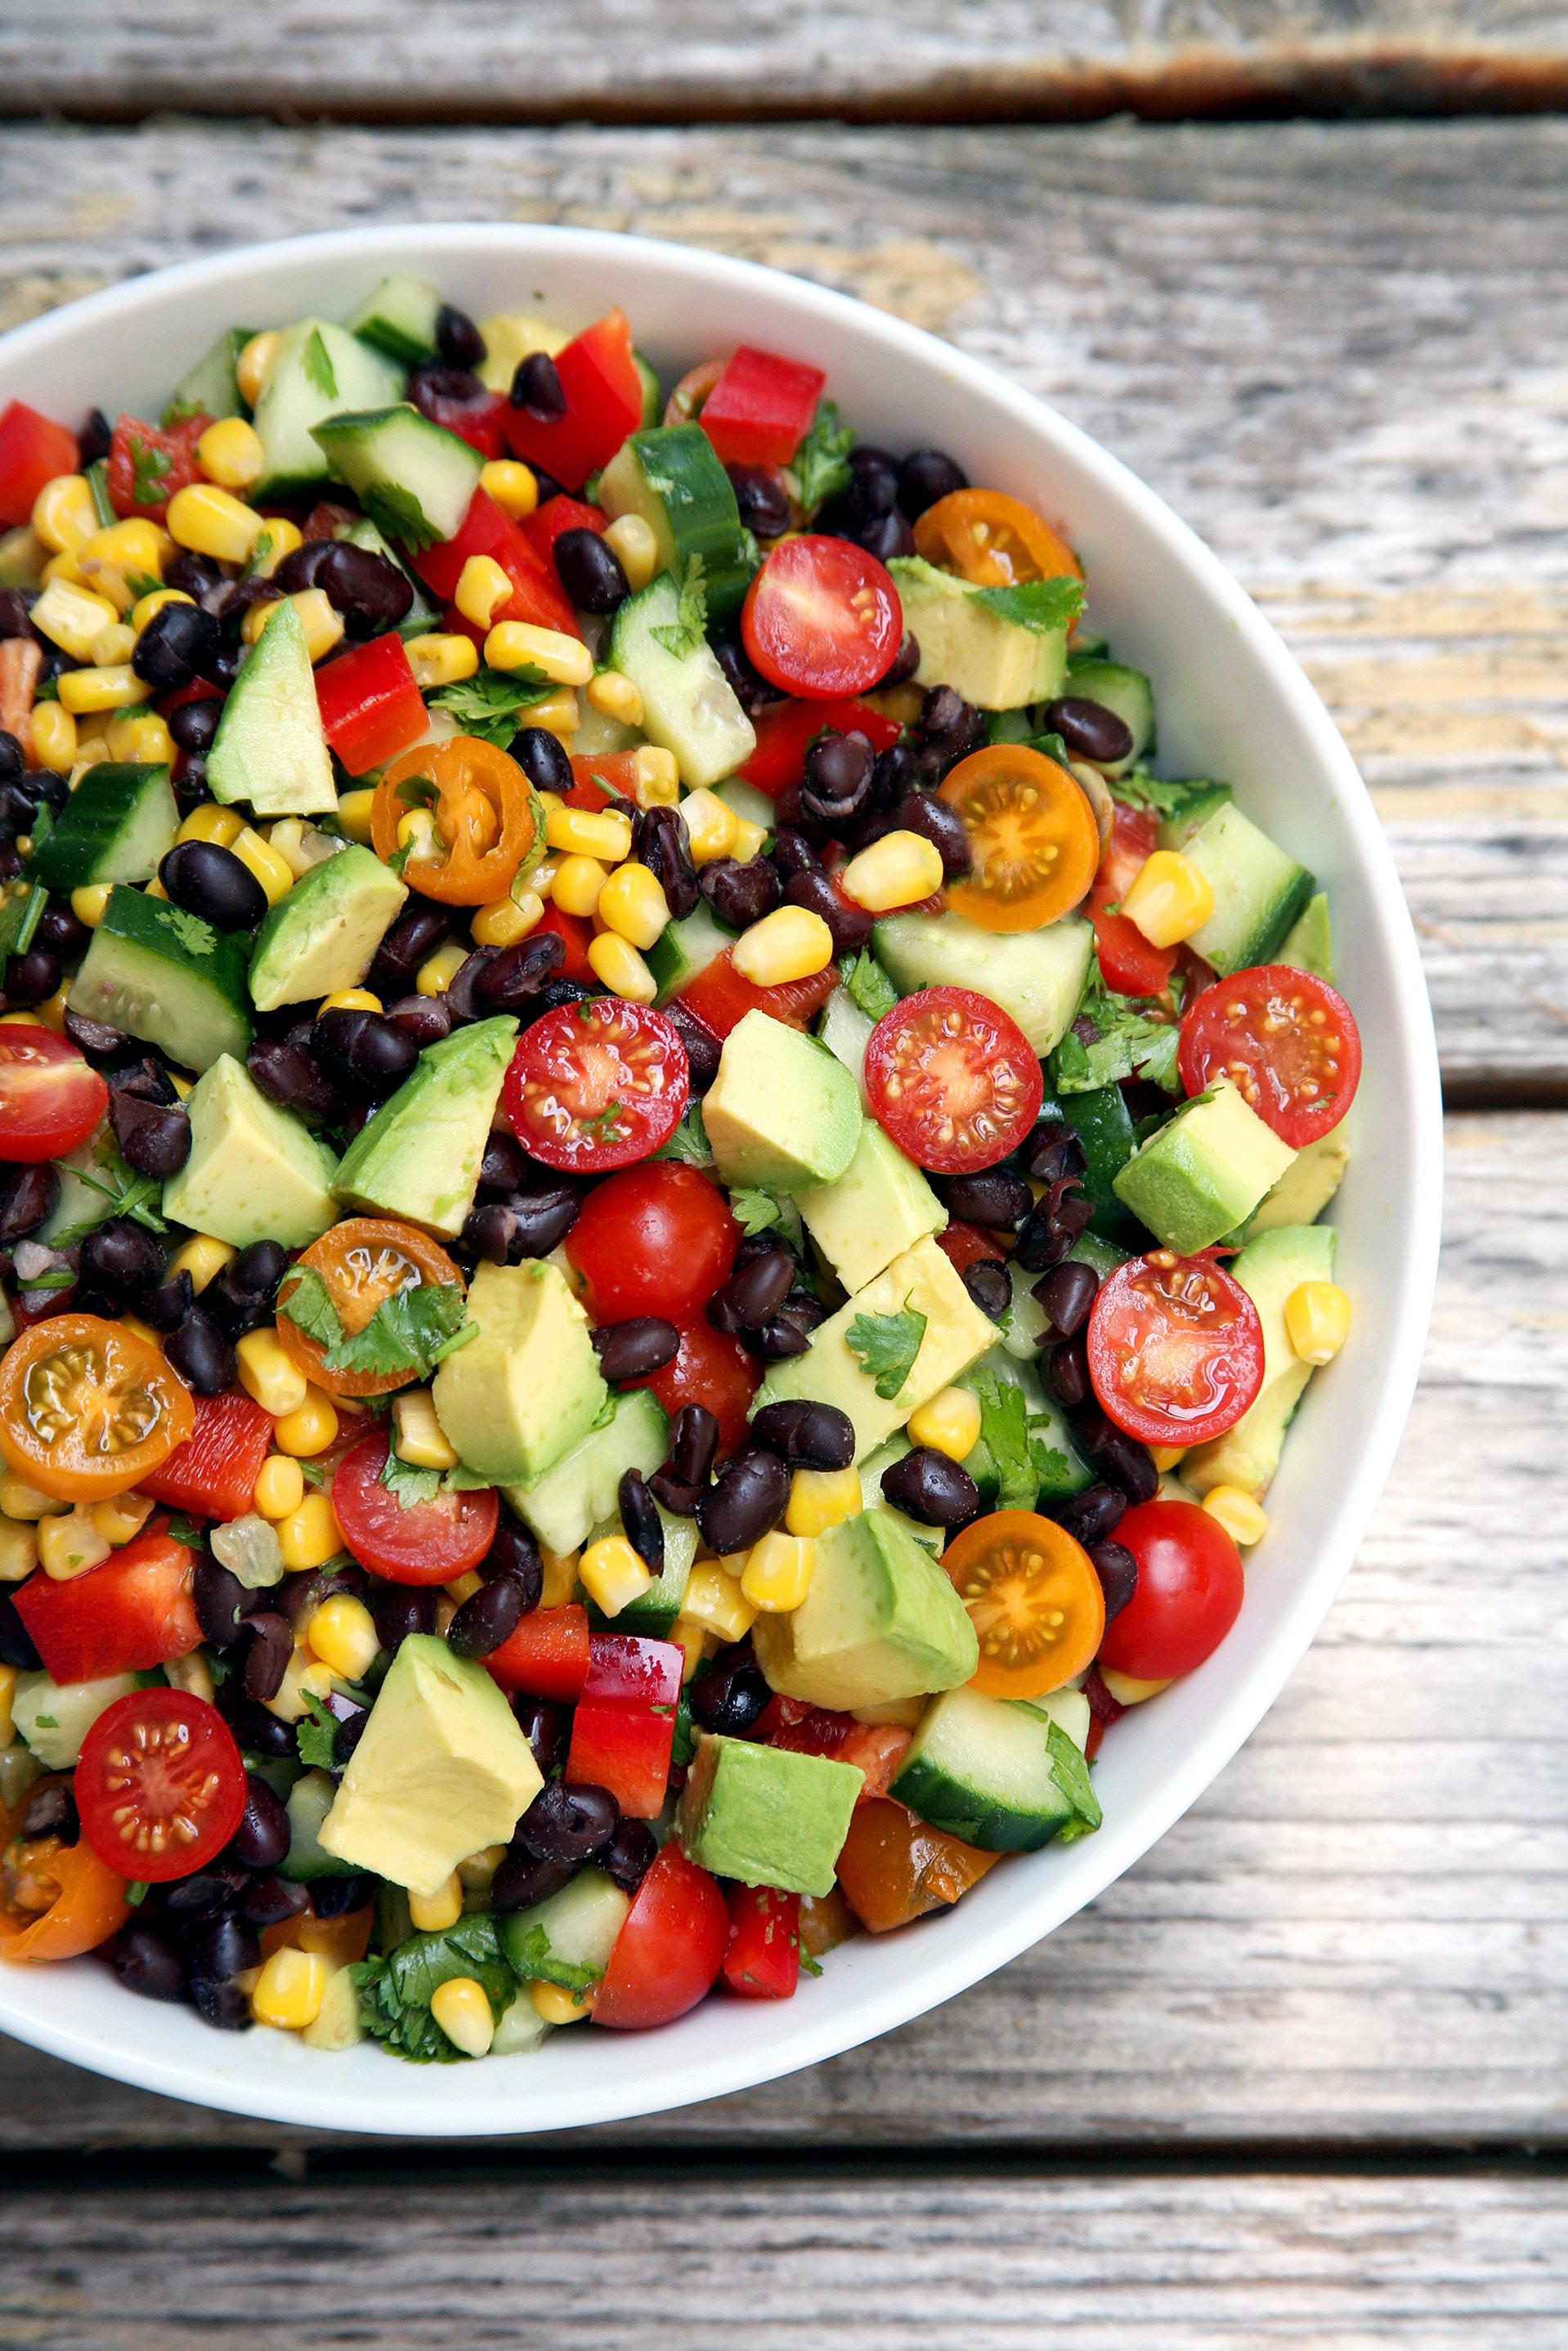 Corn And Black Bean Salad  Cucumber Black Bean Corn Tomato and Avocado Salad